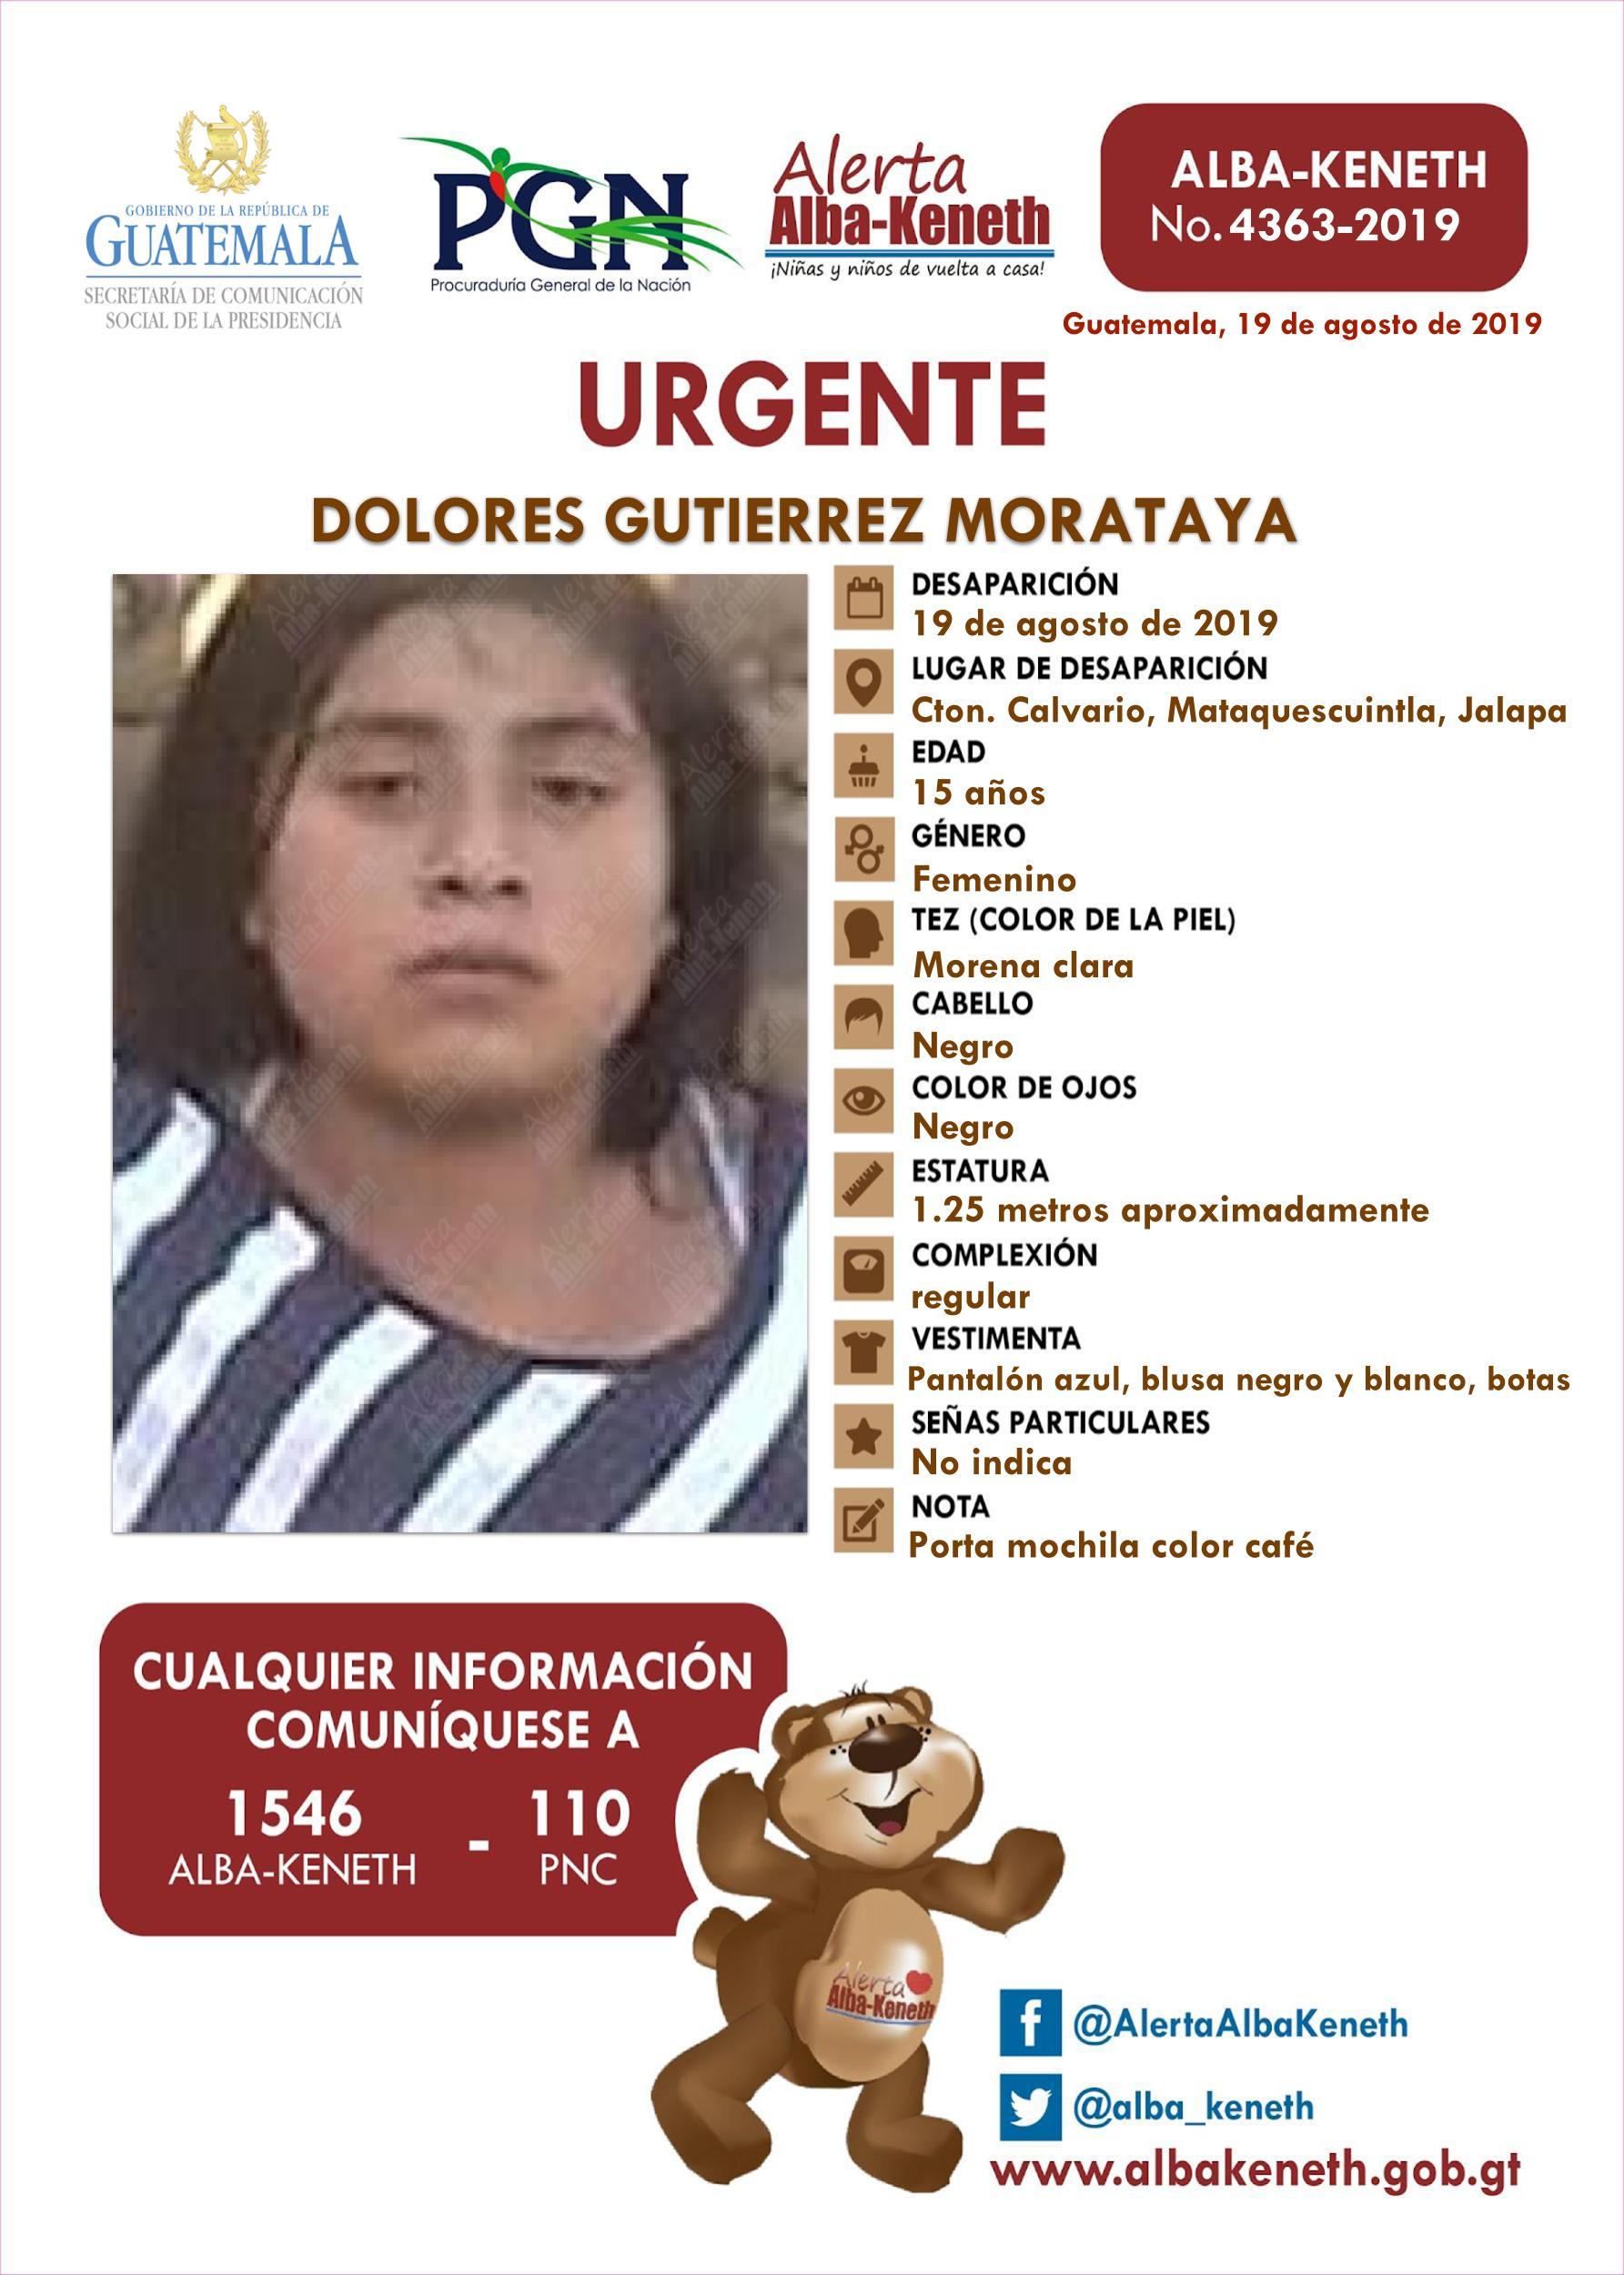 Dolores Gutierrez Morataya